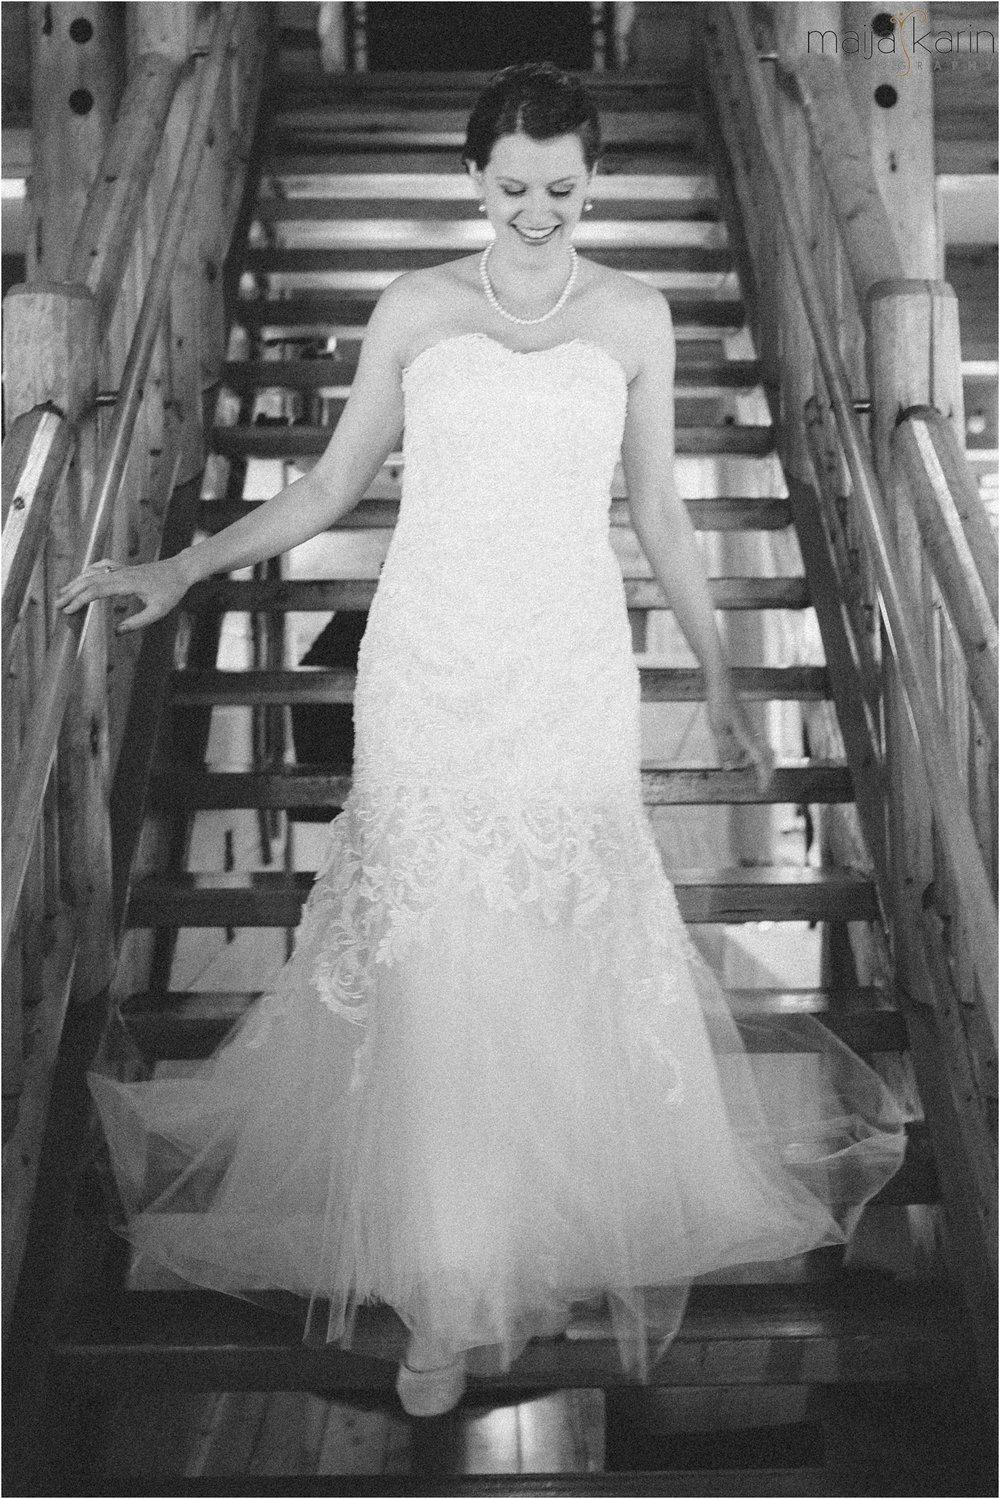 Mountain-Springs-Lodge-Leavenworth-Wedding-Maija-Karin-Photography_0003.jpg